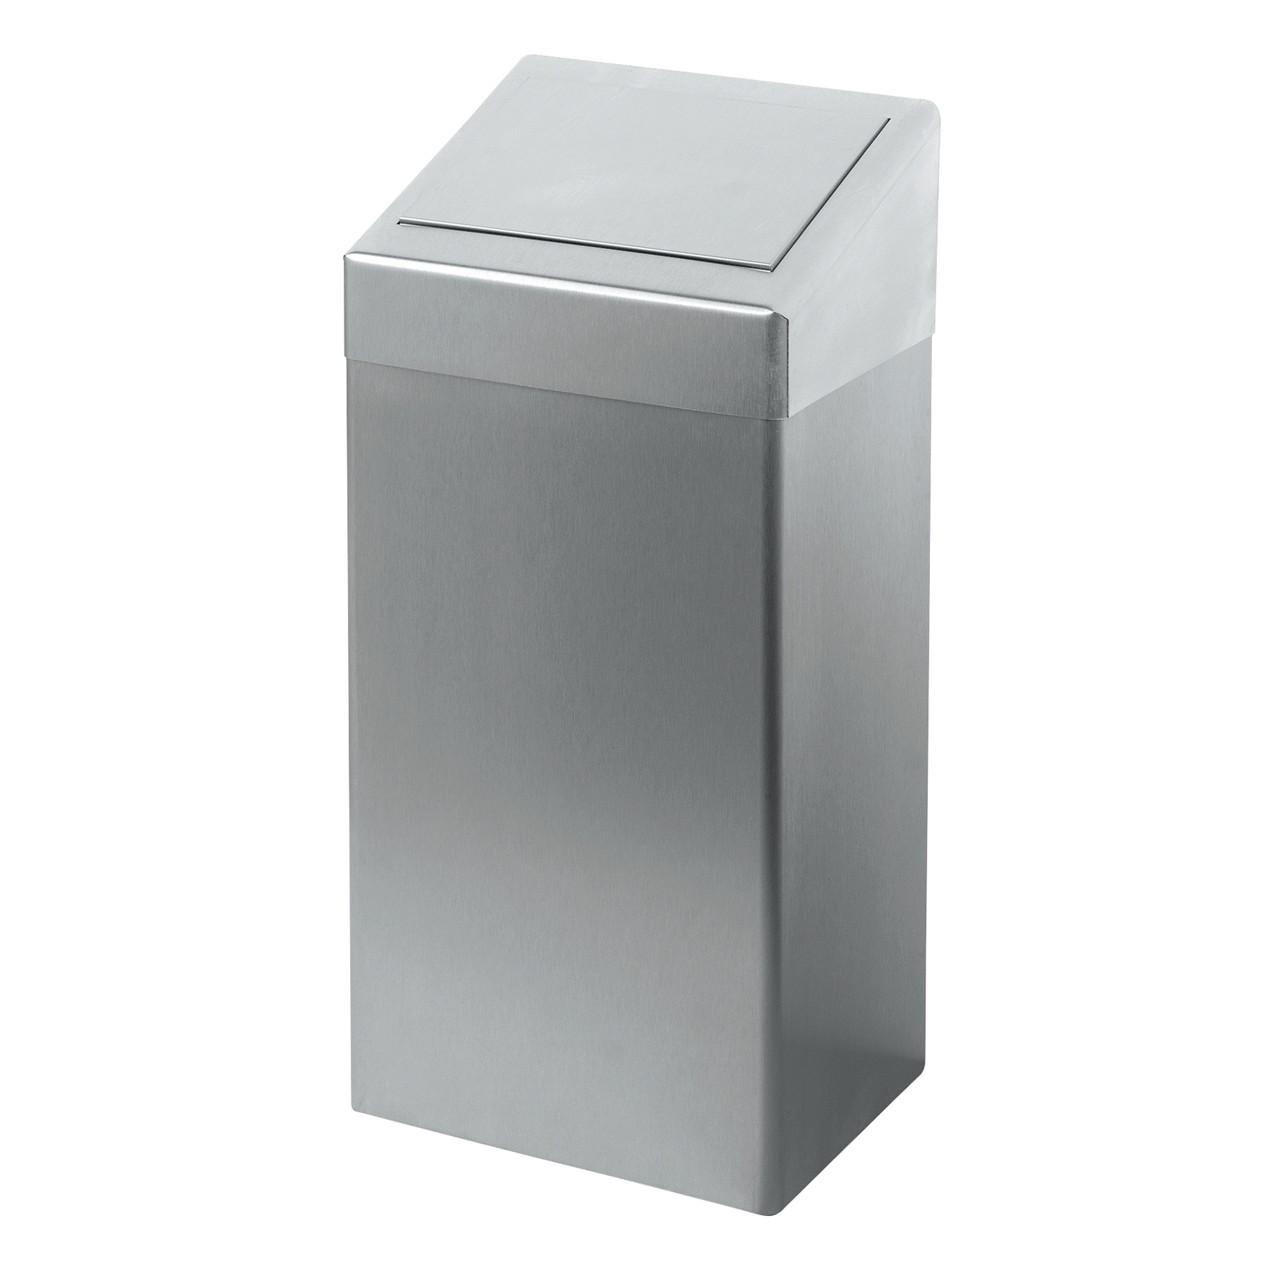 Afvalbak Keuken Aanbieding : euro 438495 rvs afvalbak met deksel ? 175 95 euro rvs afvalbak met